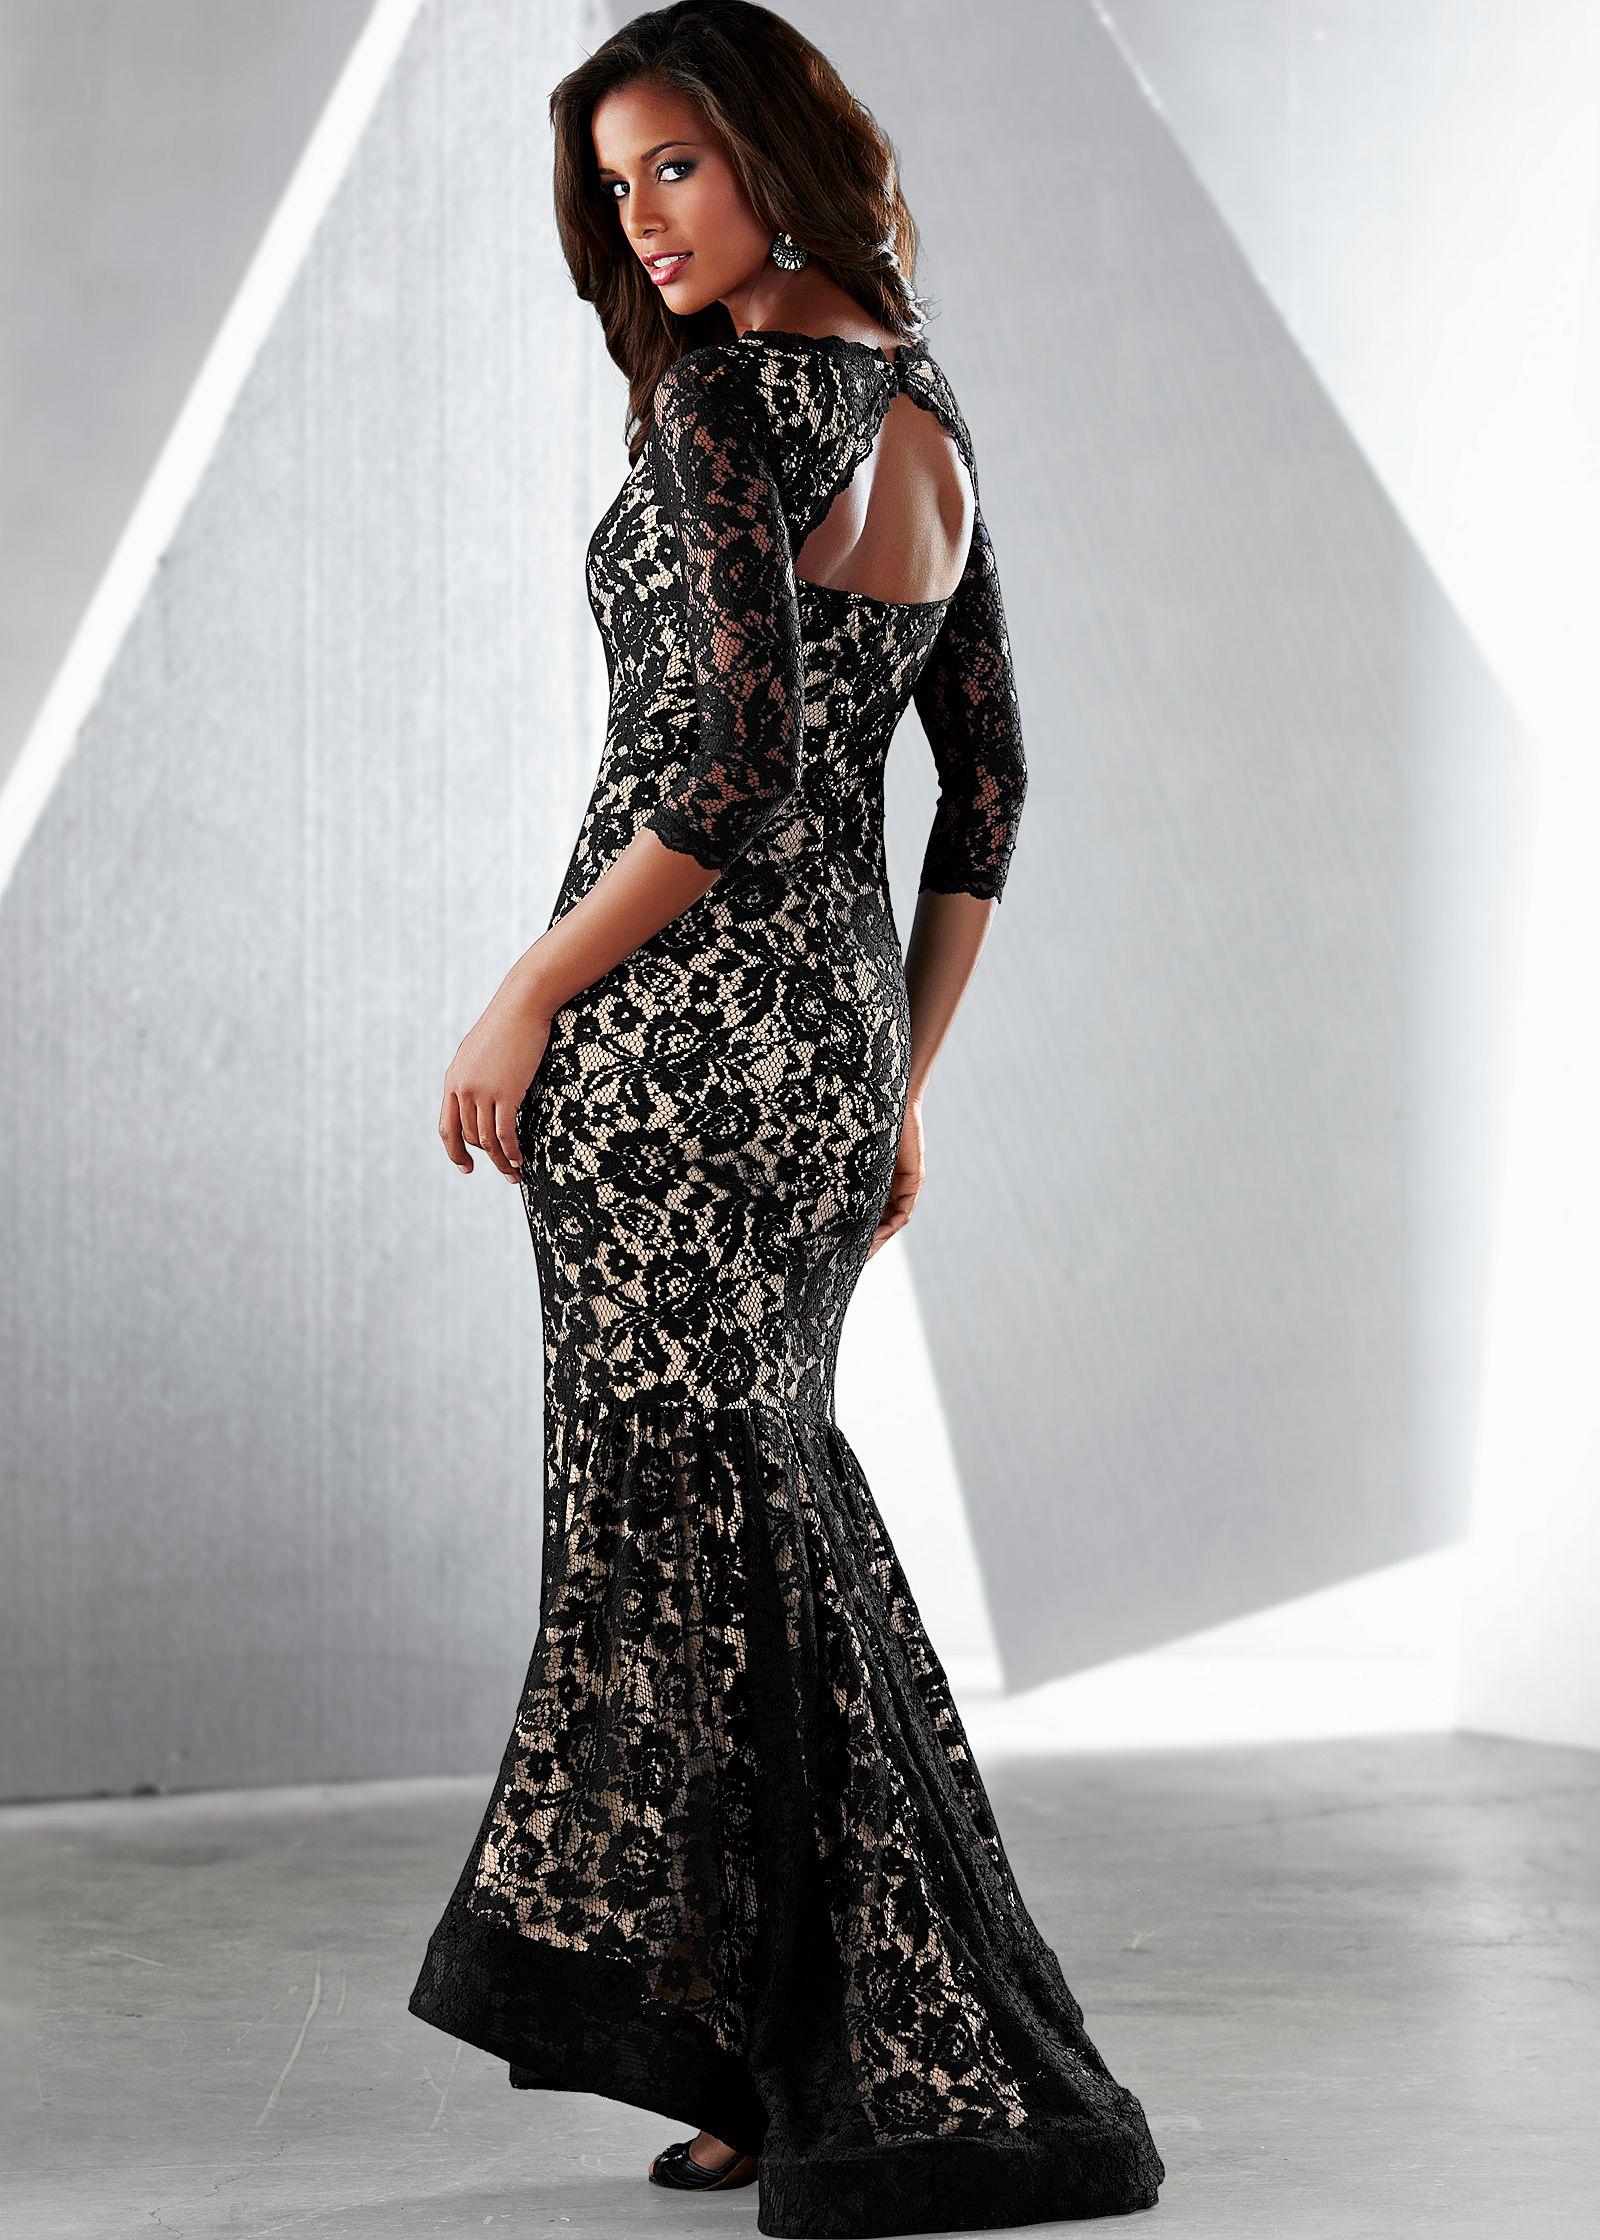 LONG LACE DRESS in Black Multi | VENUS